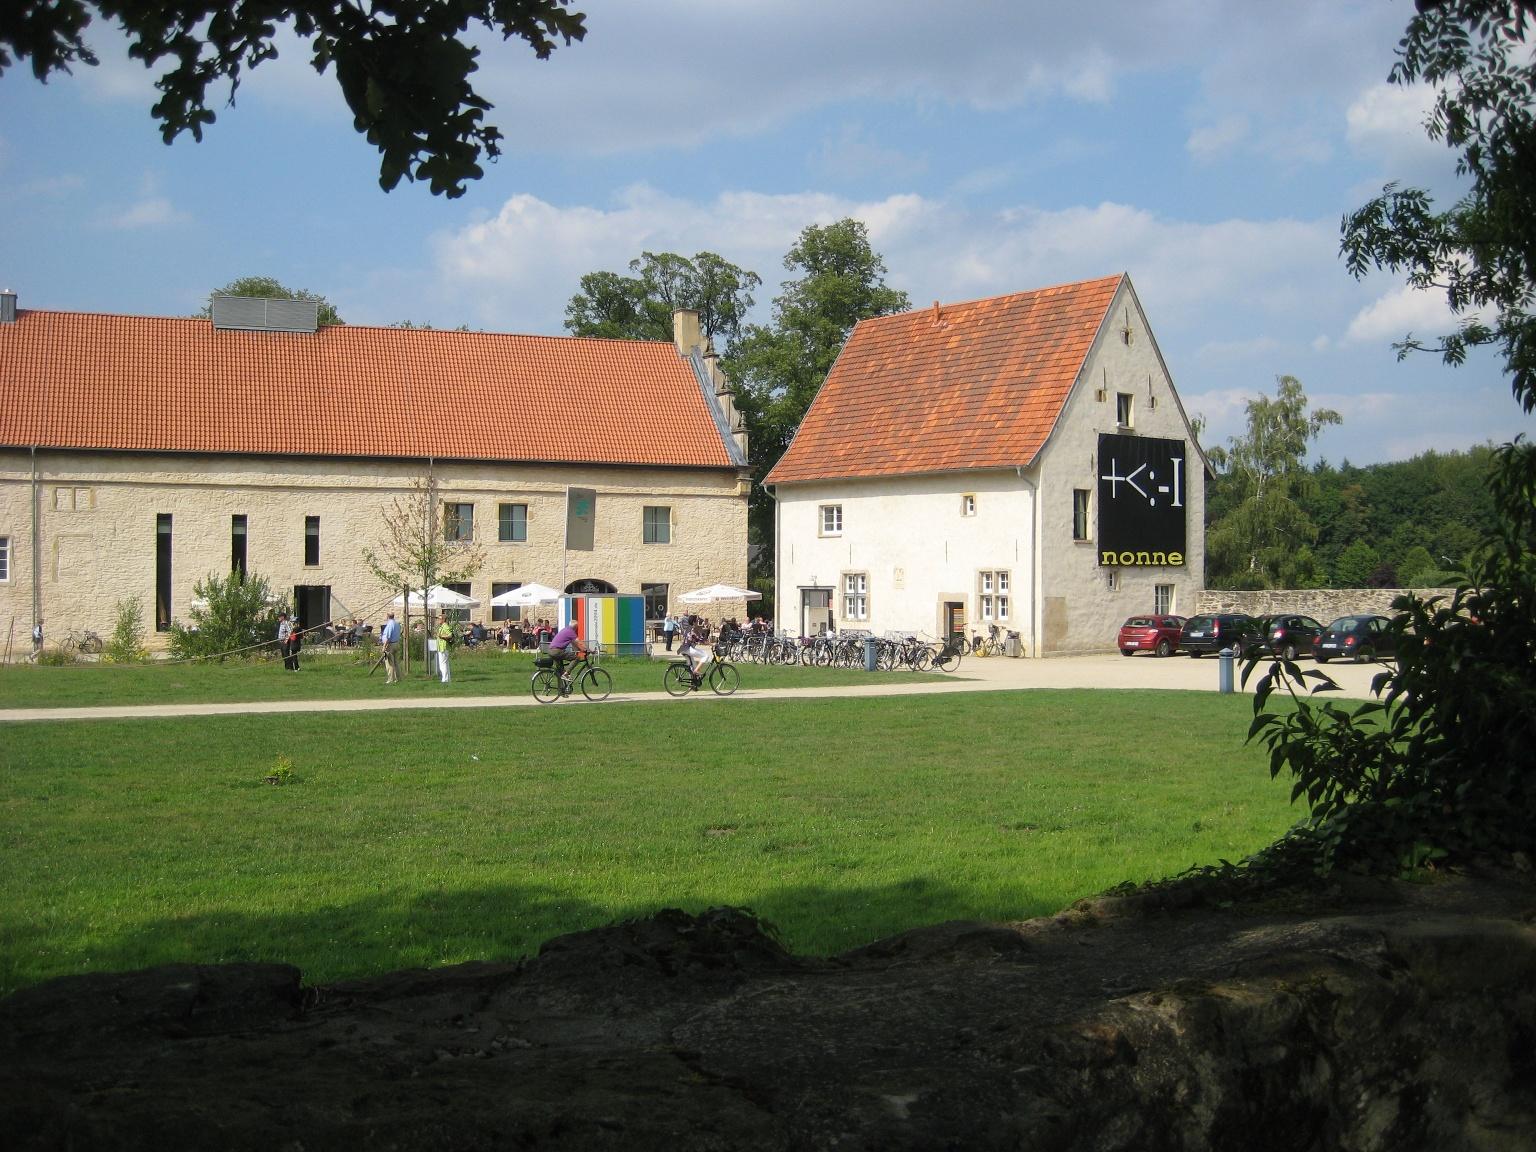 Kunsthaus Gravenhorst